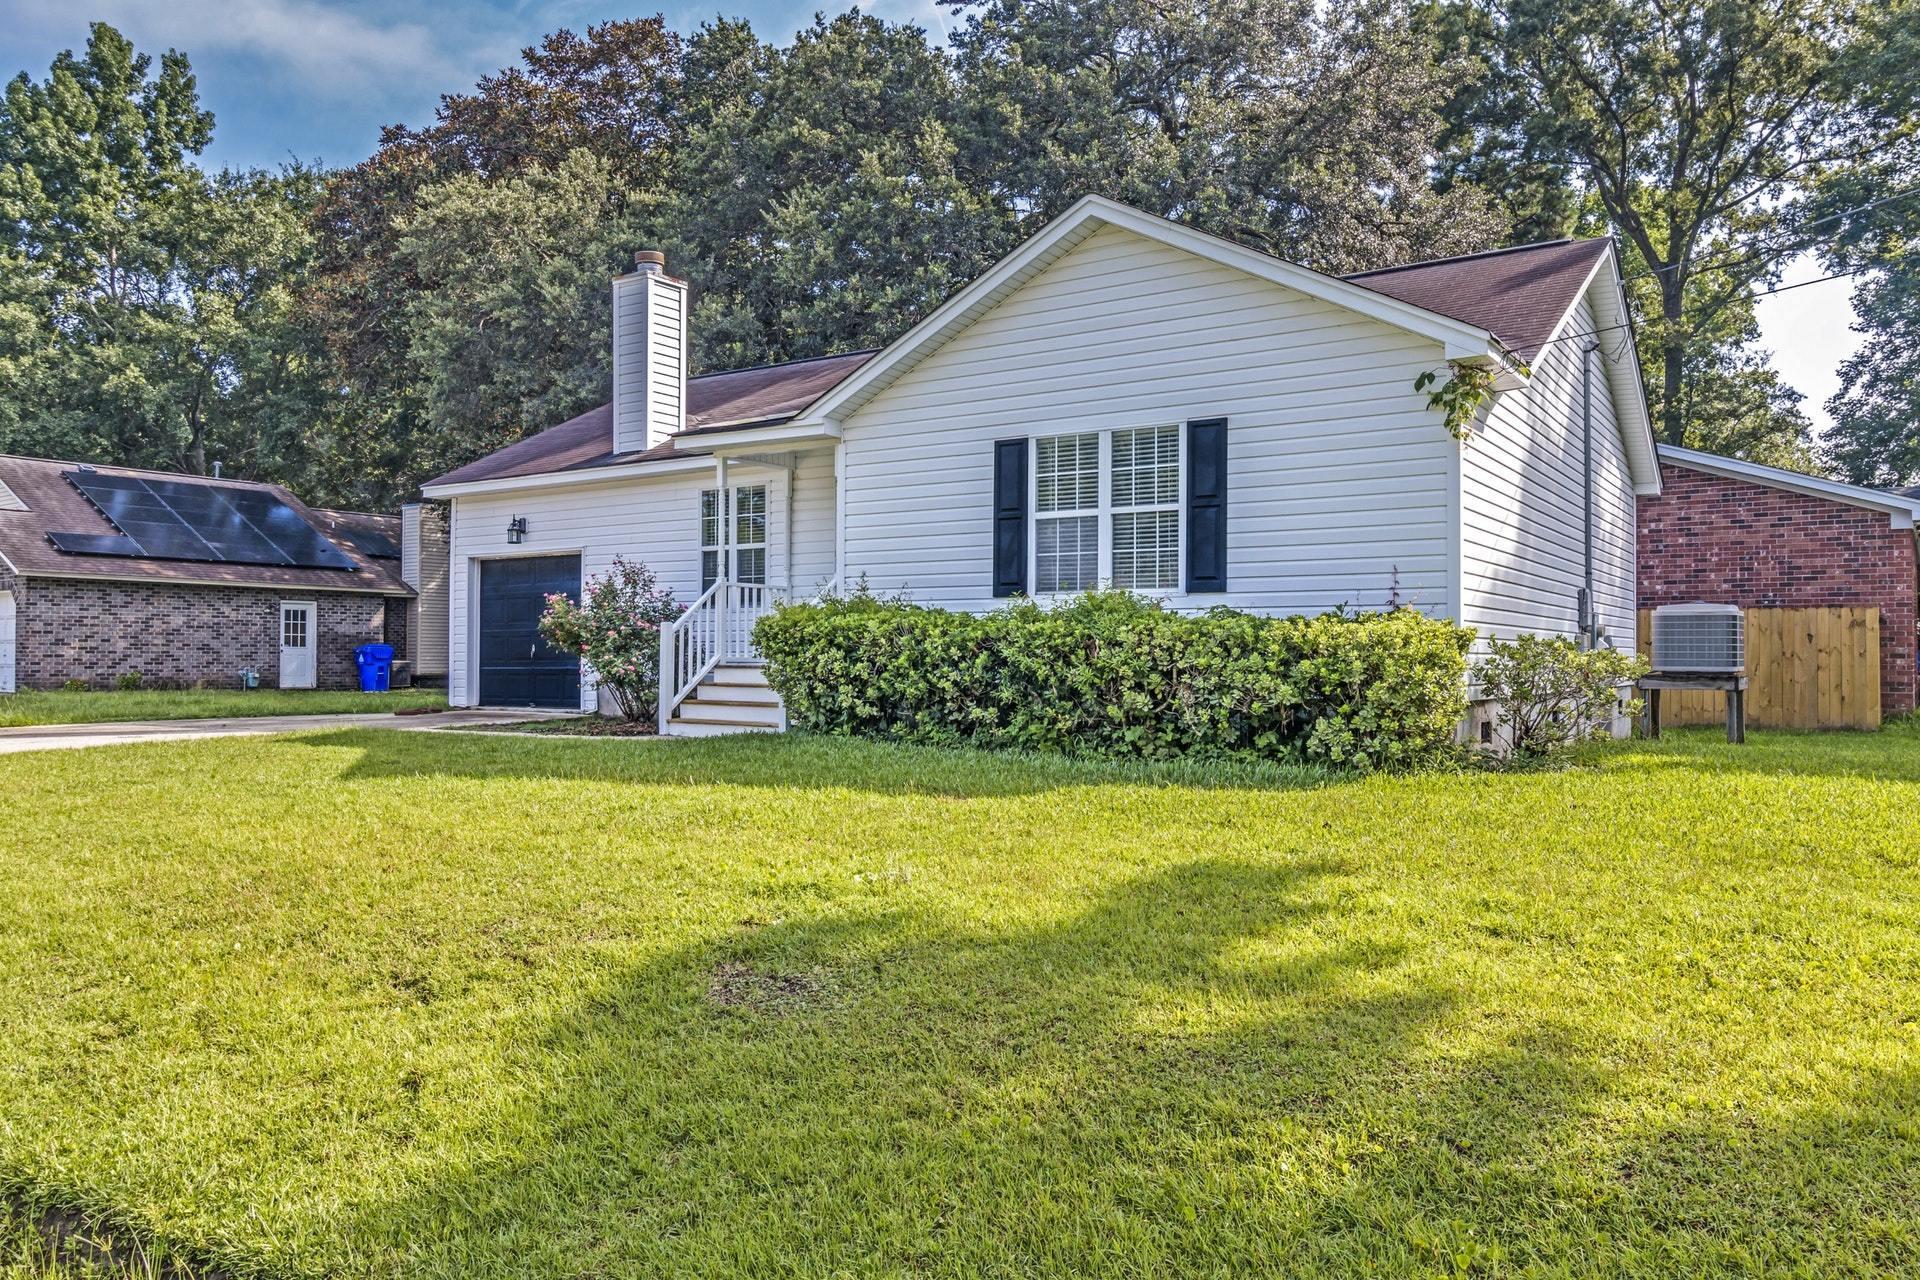 Double Oaks Homes For Sale - 2402 Double Oak, Charleston, SC - 1